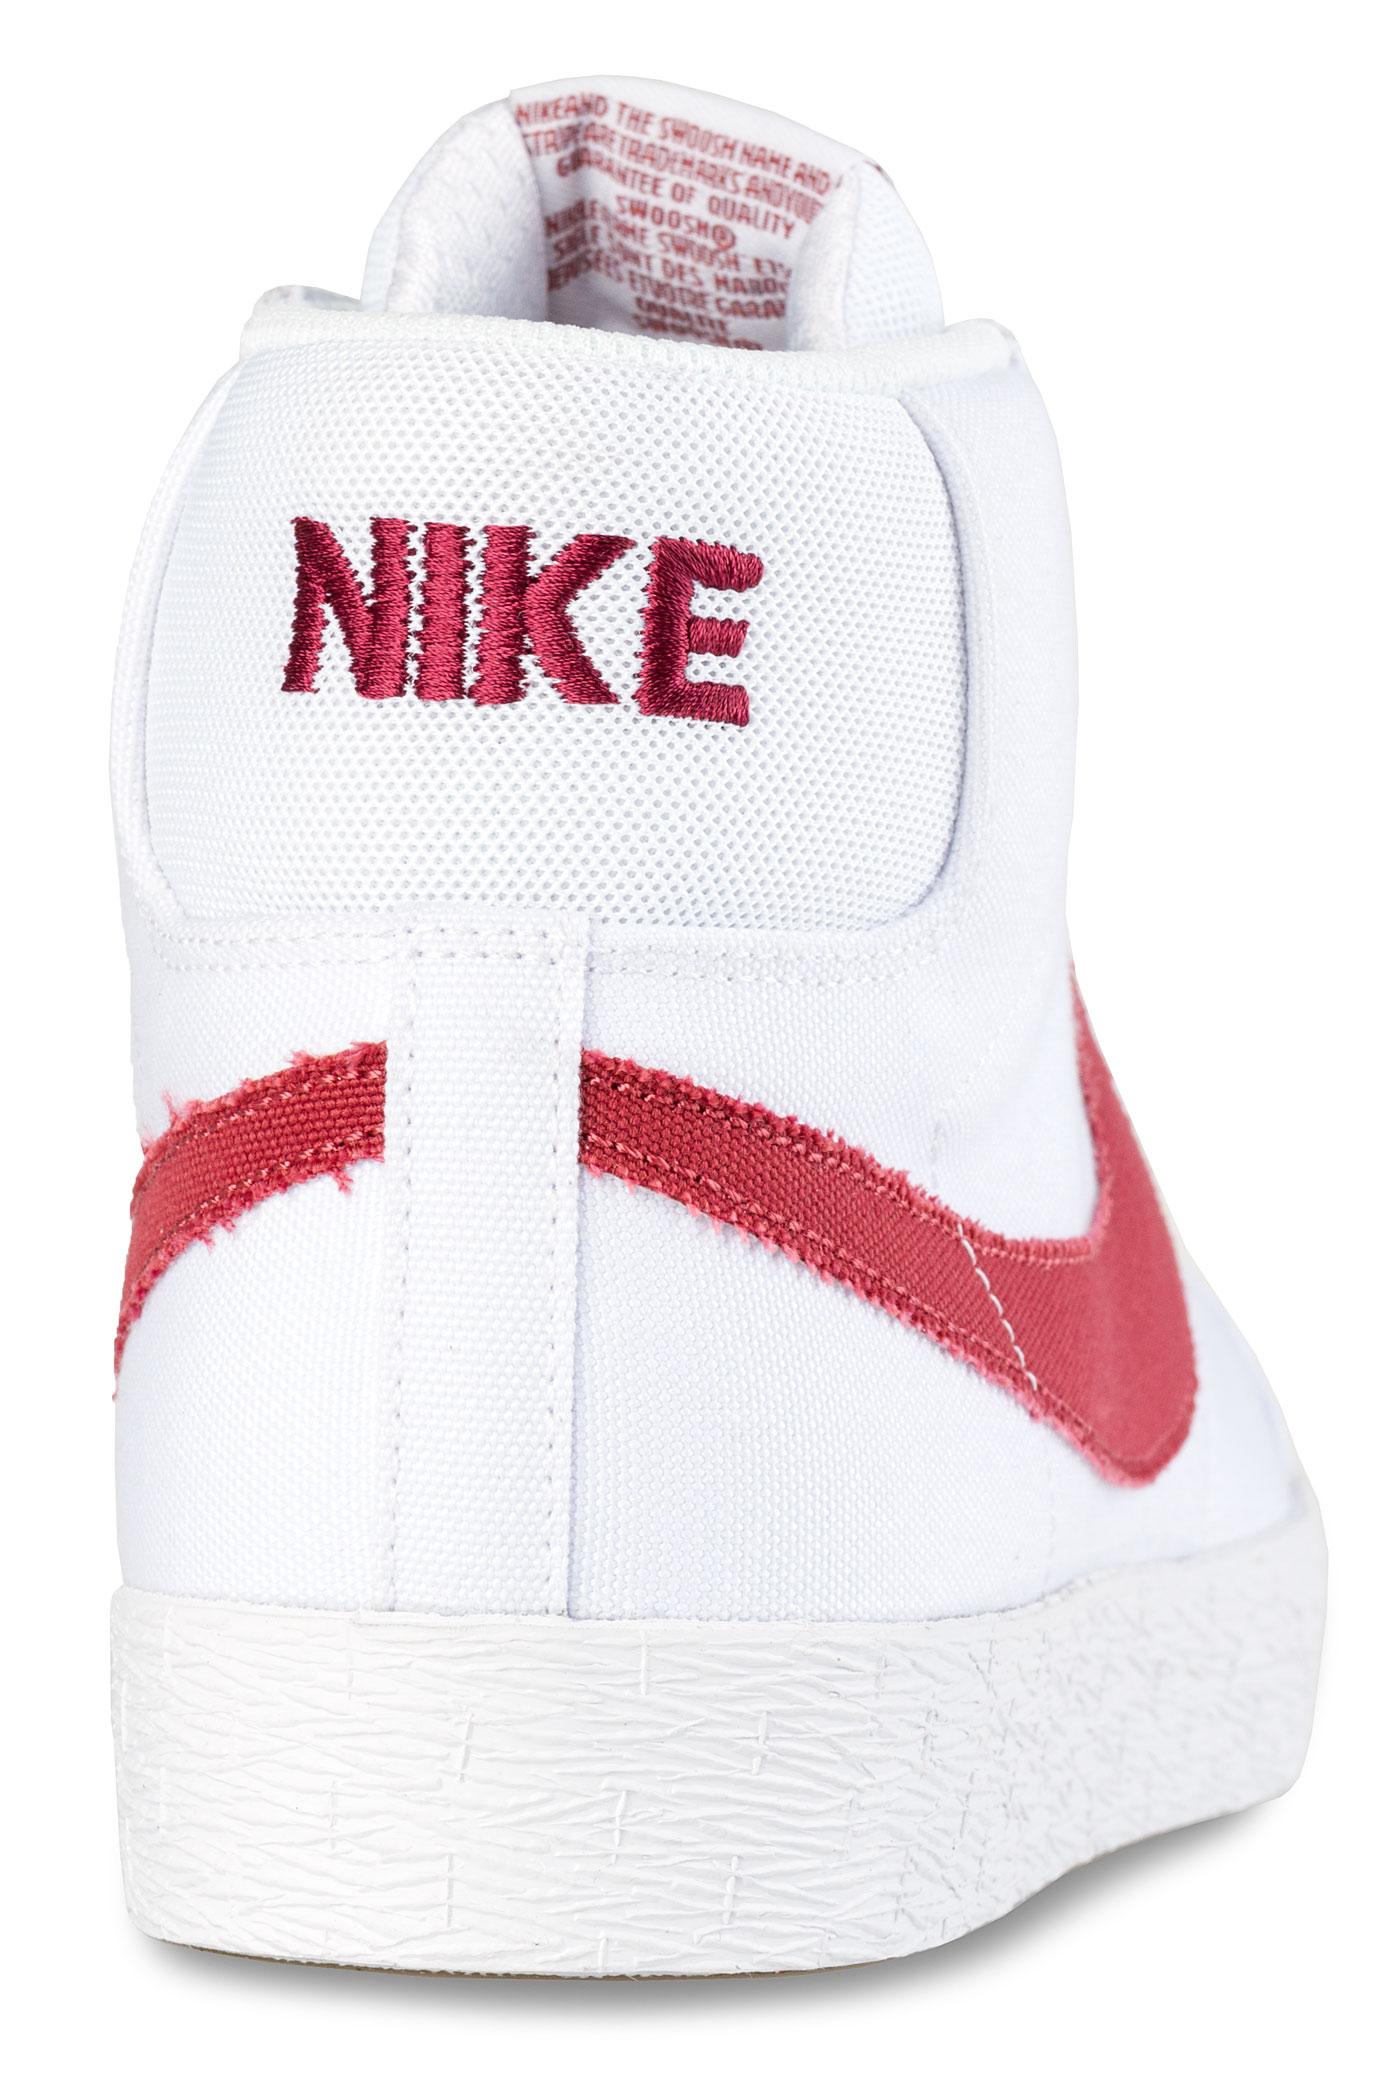 best sneakers a9cf3 96380 cheapest nike sb blazer mid canvas white cedar 04ec0 c4699